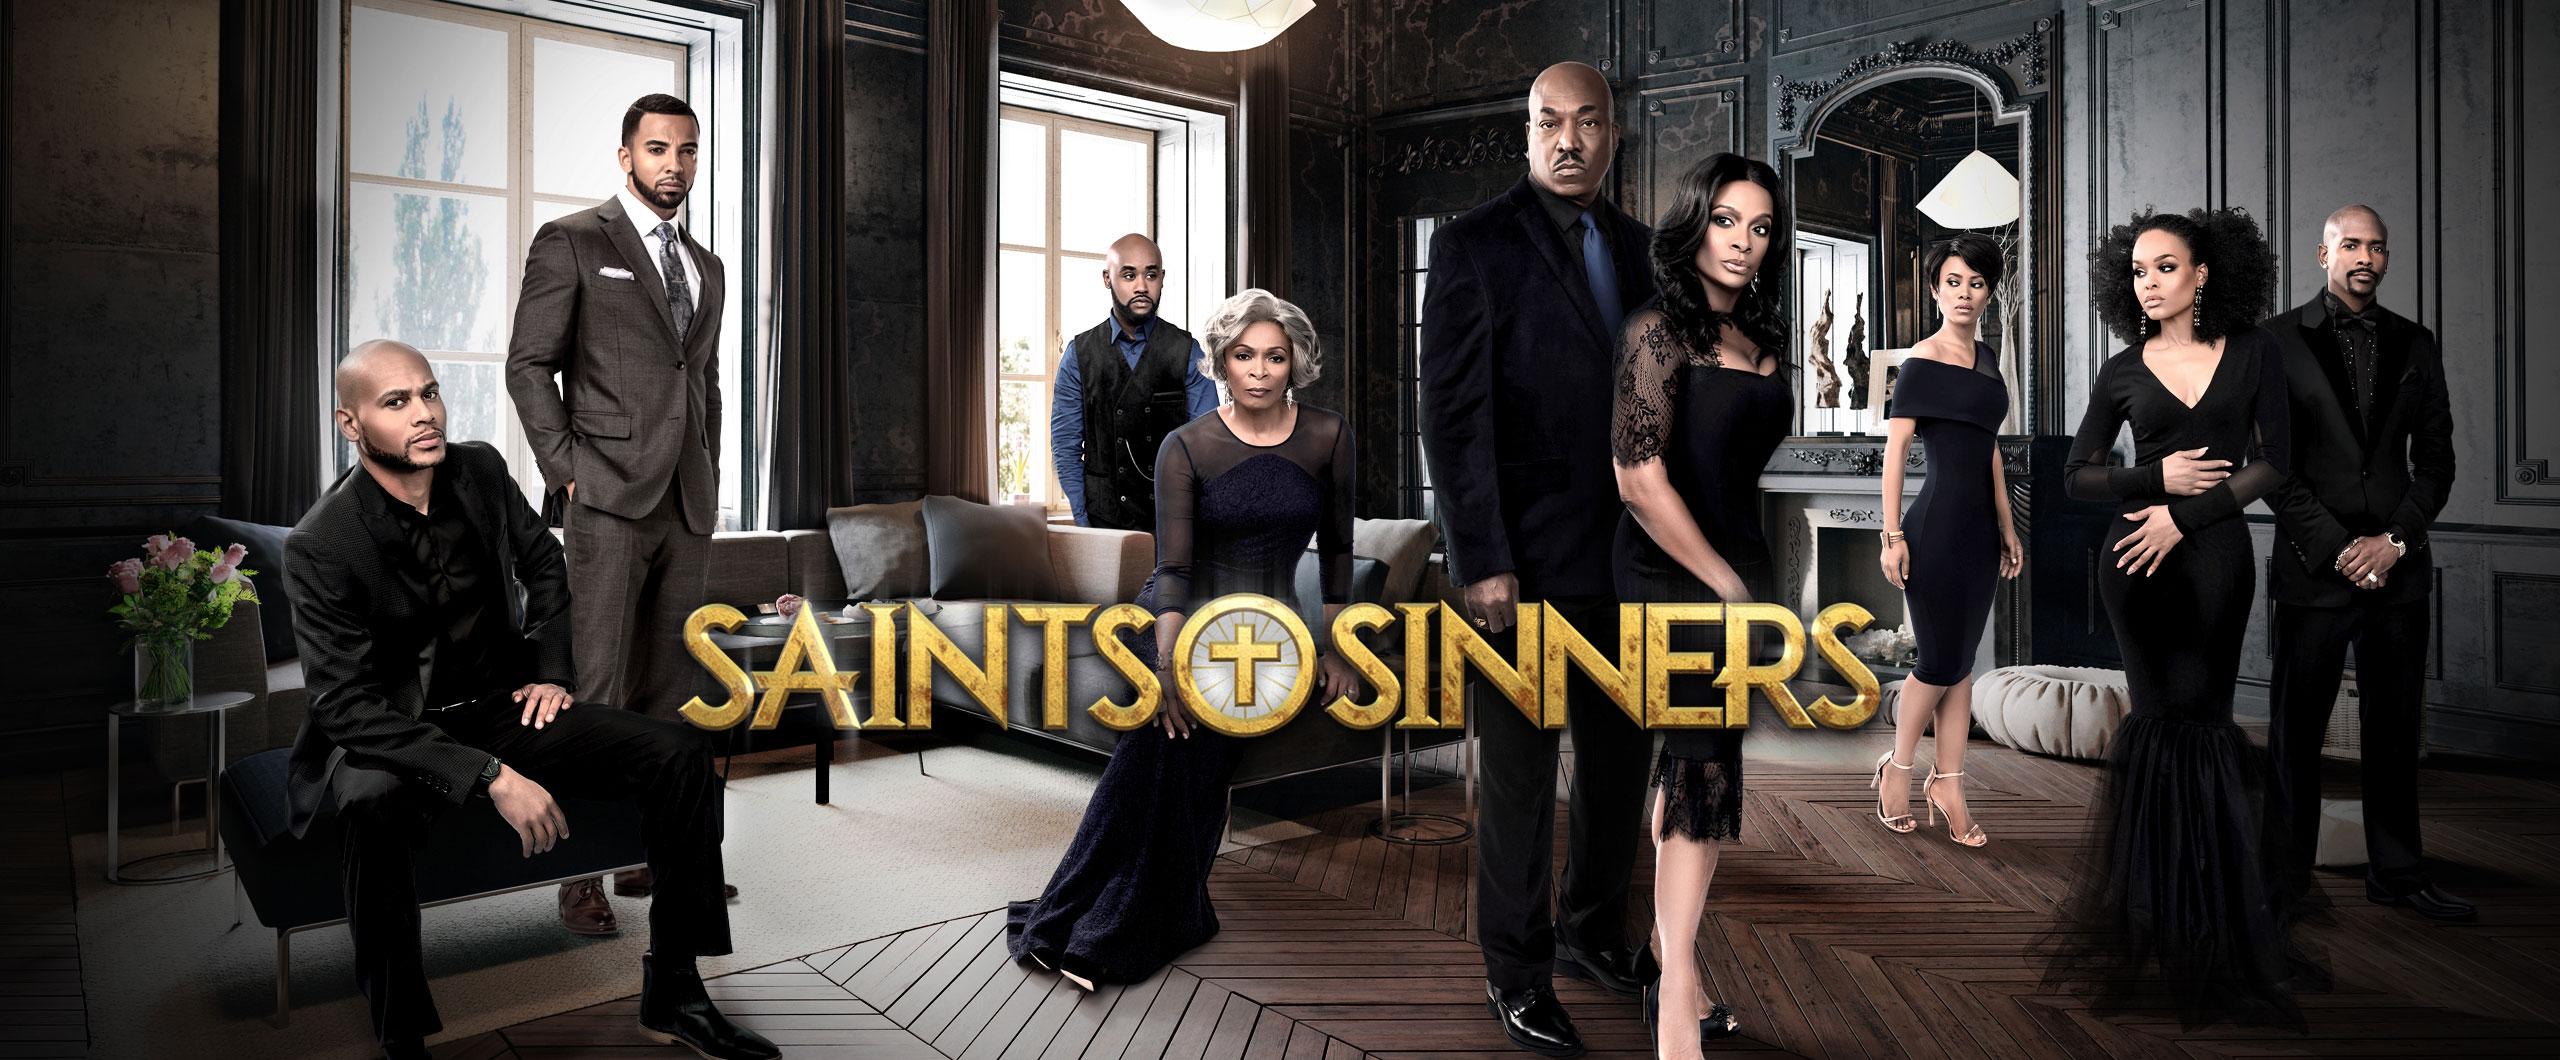 Bounce's Saints & Sinners.